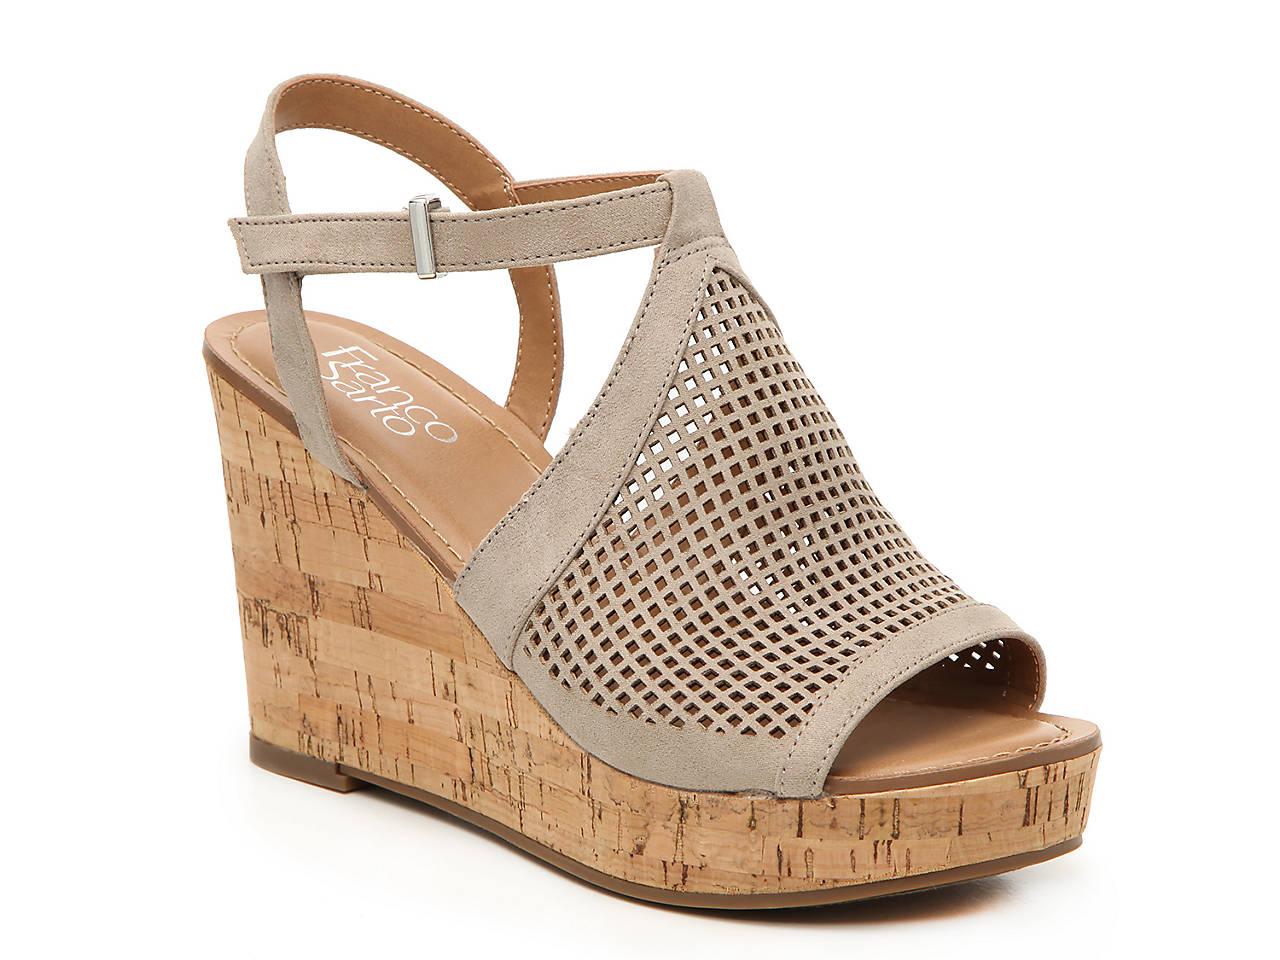 6e2028ceab Franco Sarto Canyon Wedge Sandal Women s Shoes